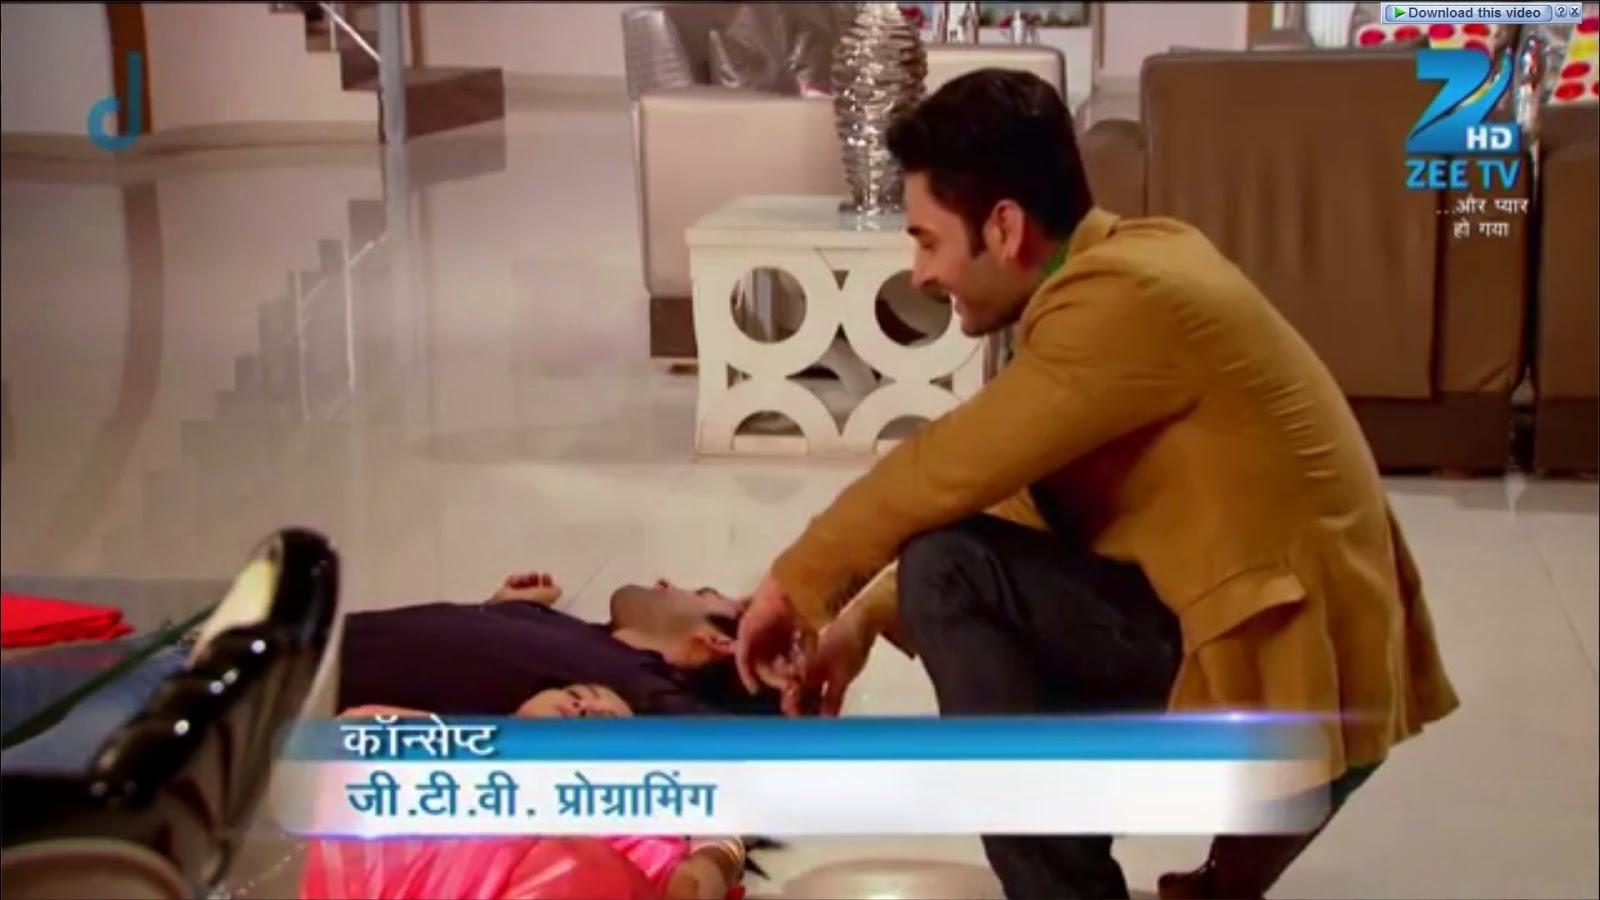 Aur Pyaar Ho Gaya - Episode 233 - November 21, 2014 - ZEE TV